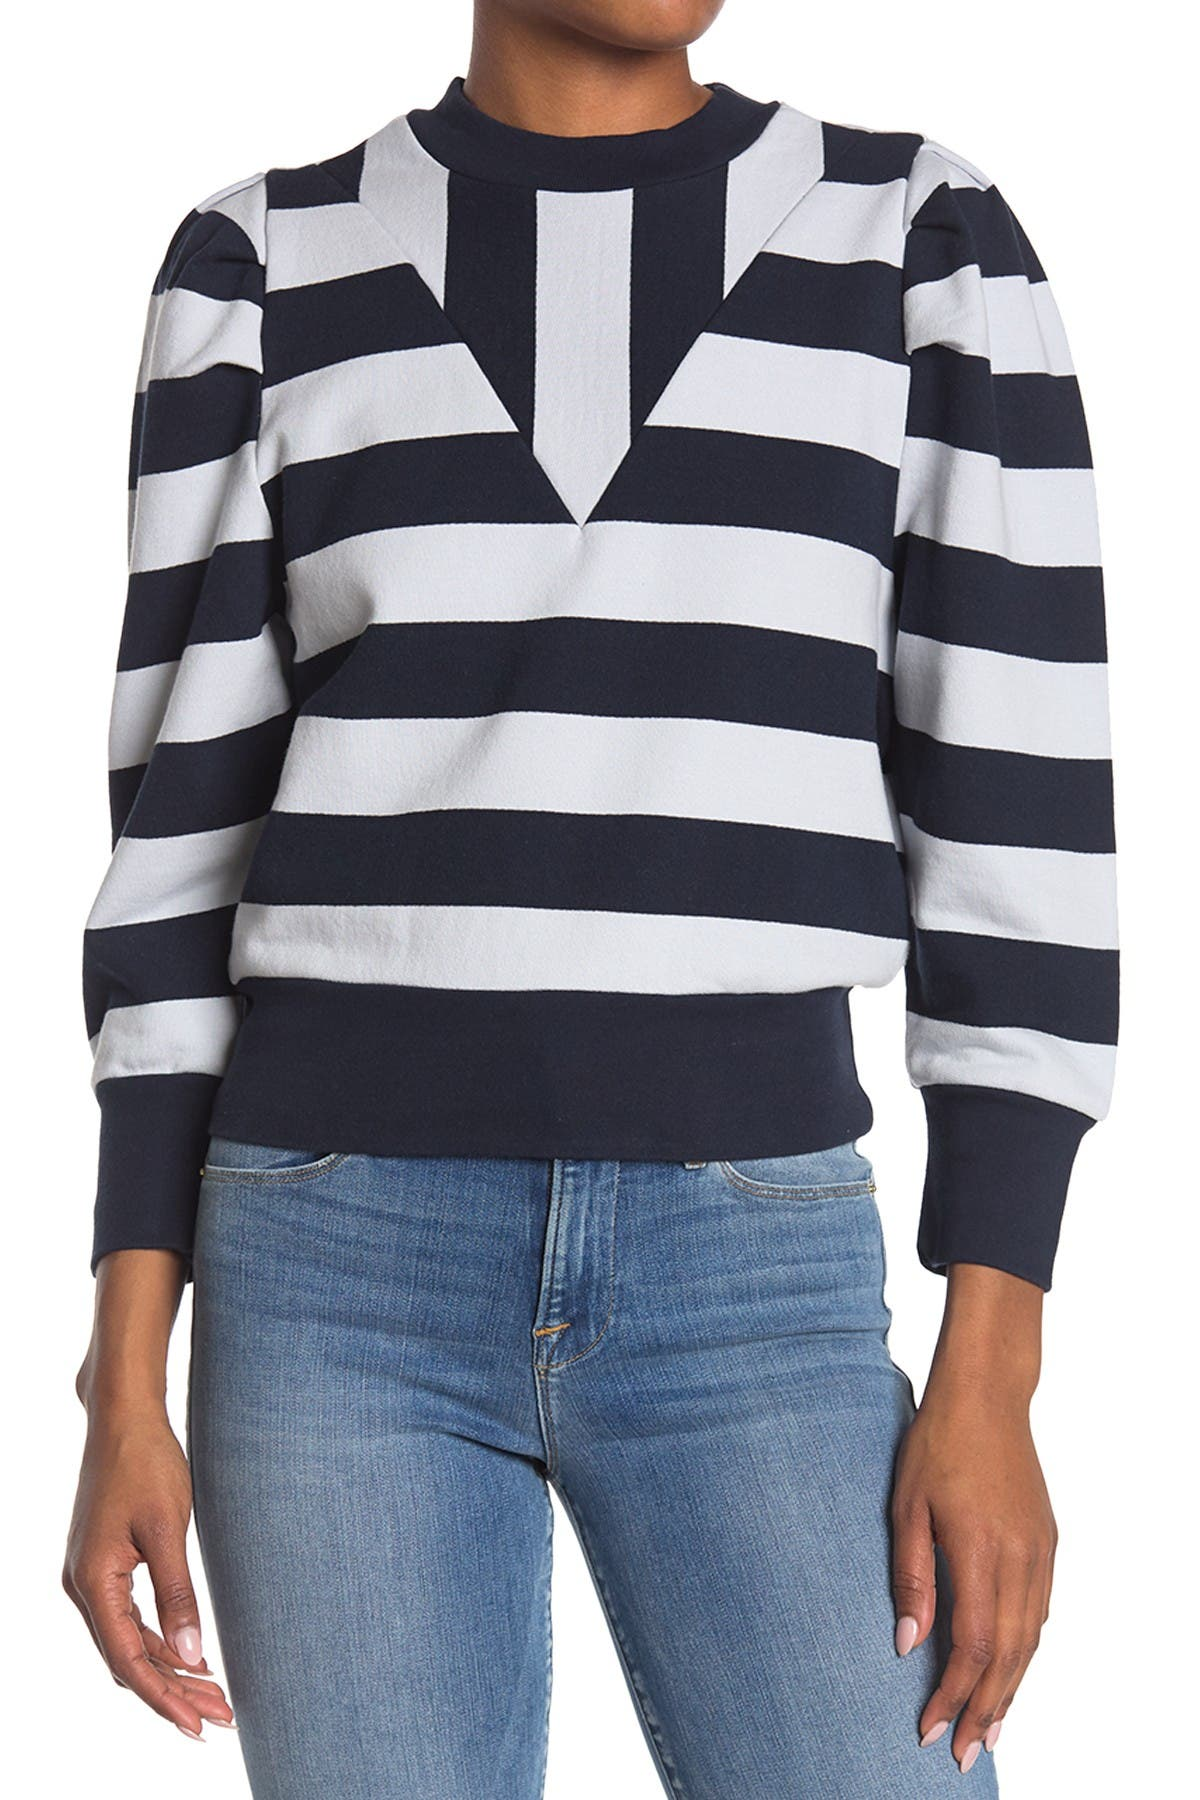 Image of FRAME Rugby Stripe Print Shirred Sweatshirt